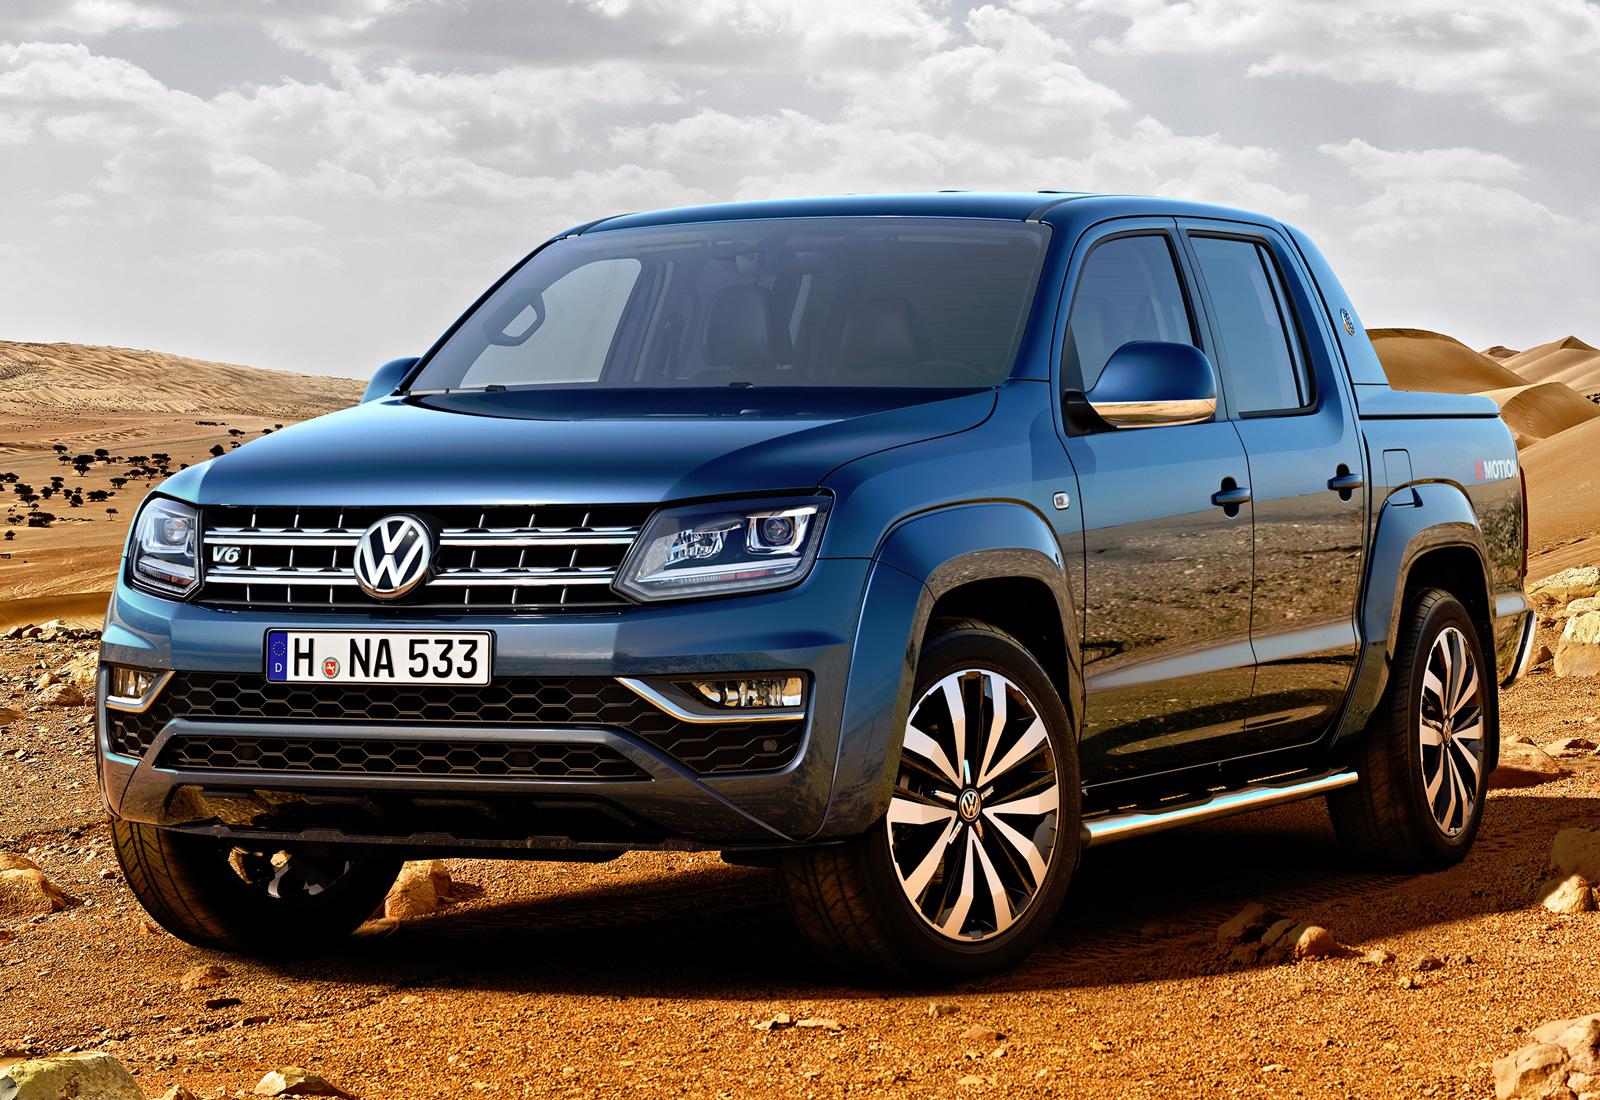 Volkswagen Amarok 2016 2017 цена фото комплектации